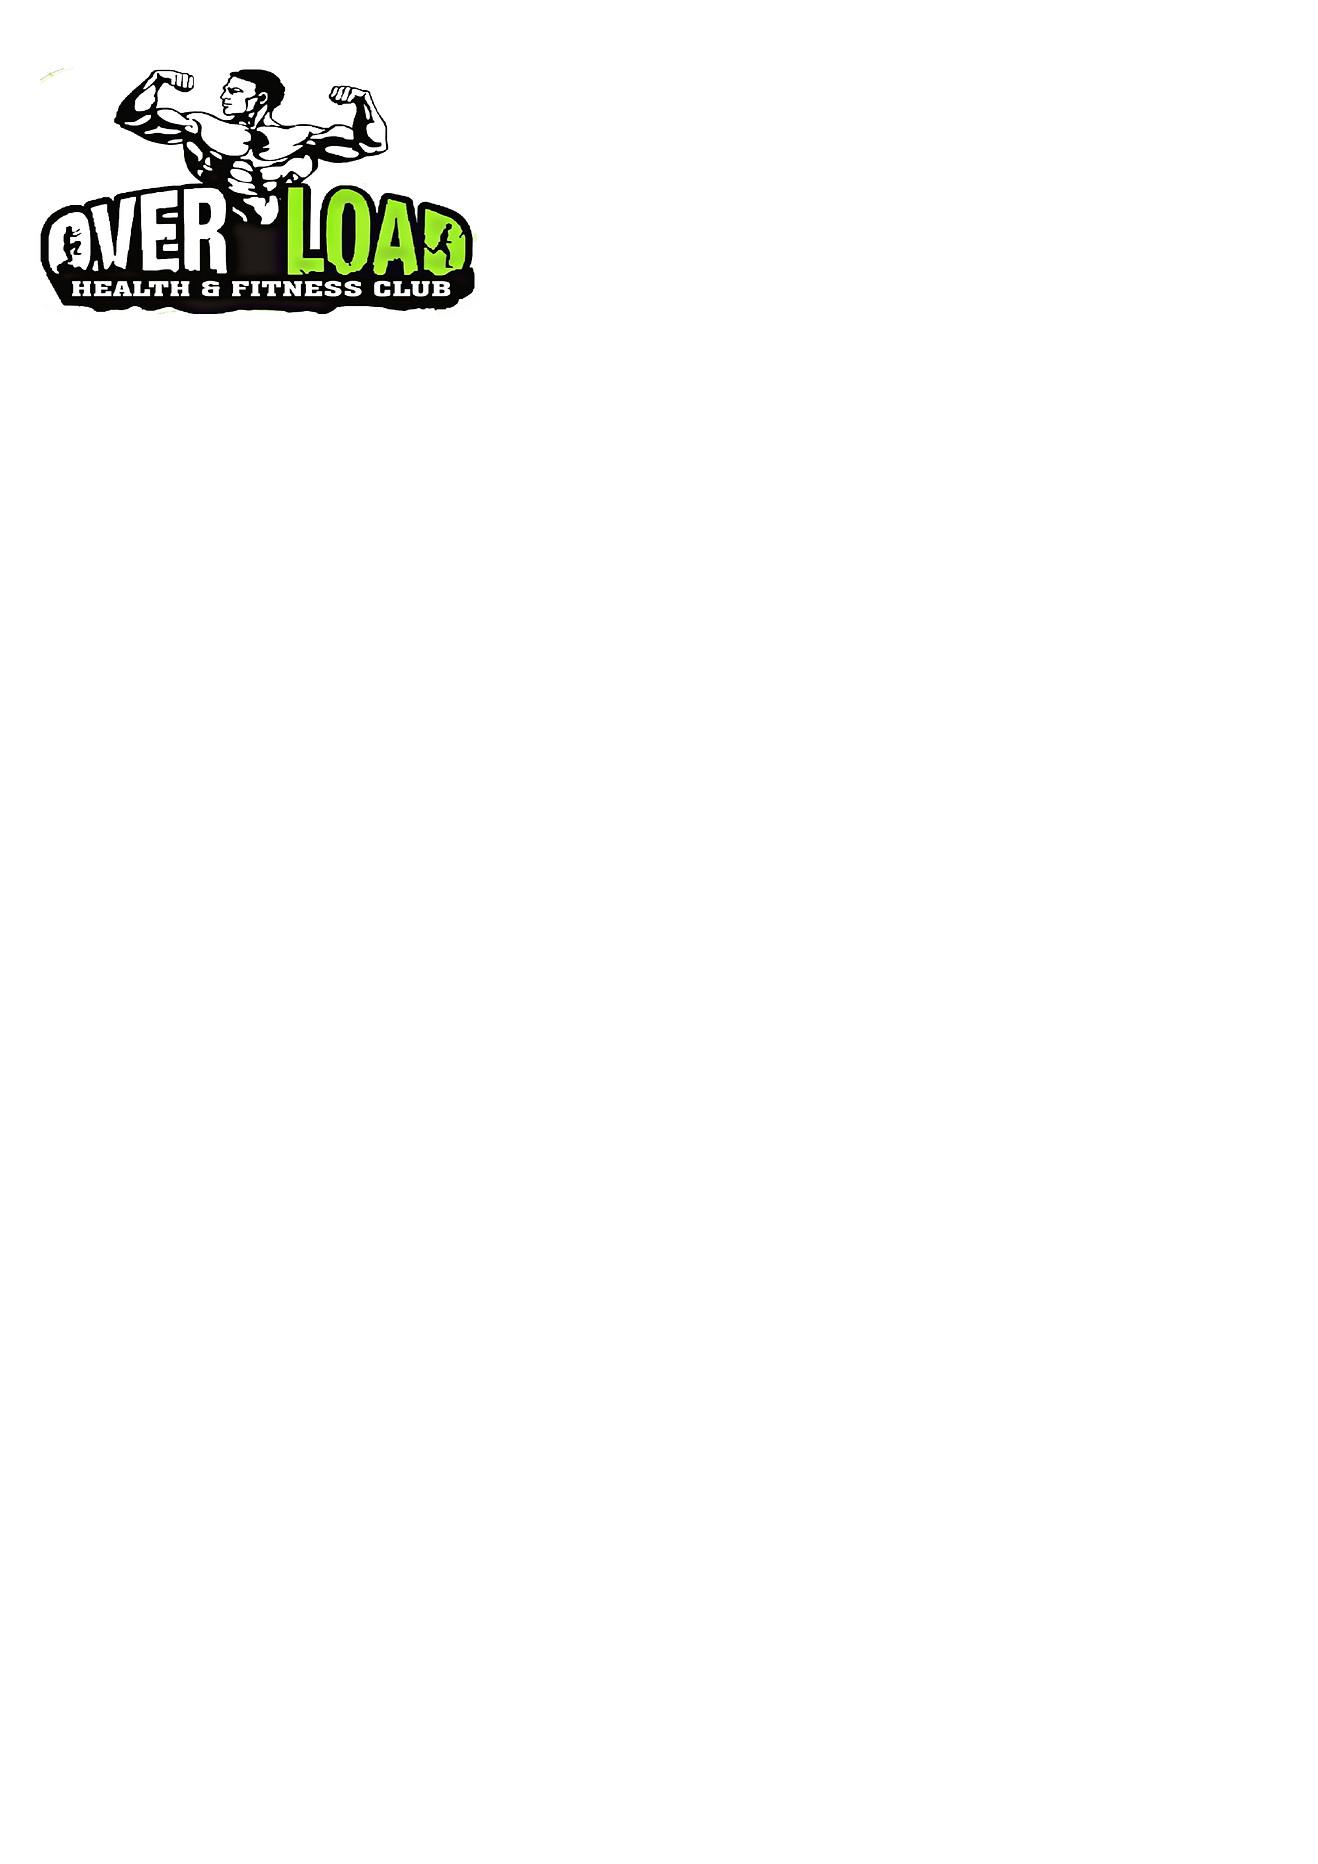 Doc12882-page0001.jpg